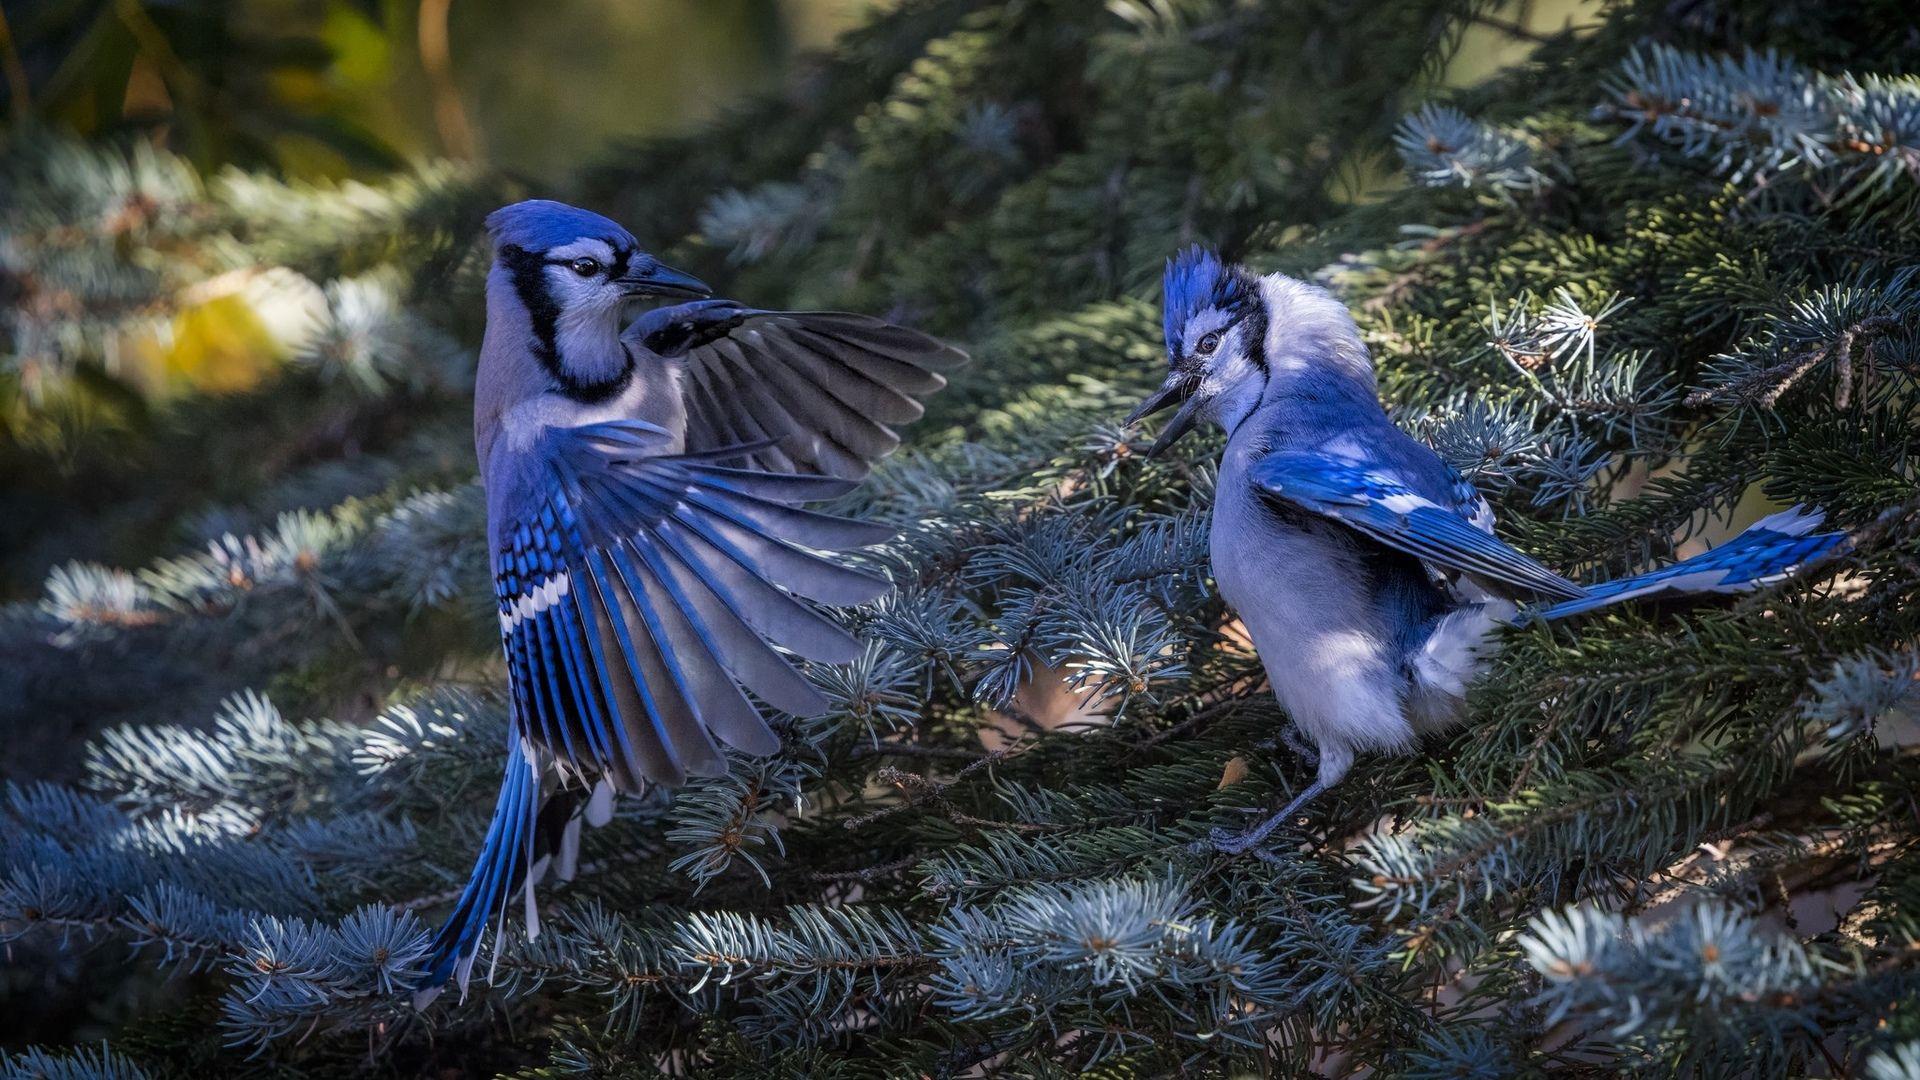 Blue Jays hd wallpaper 1080